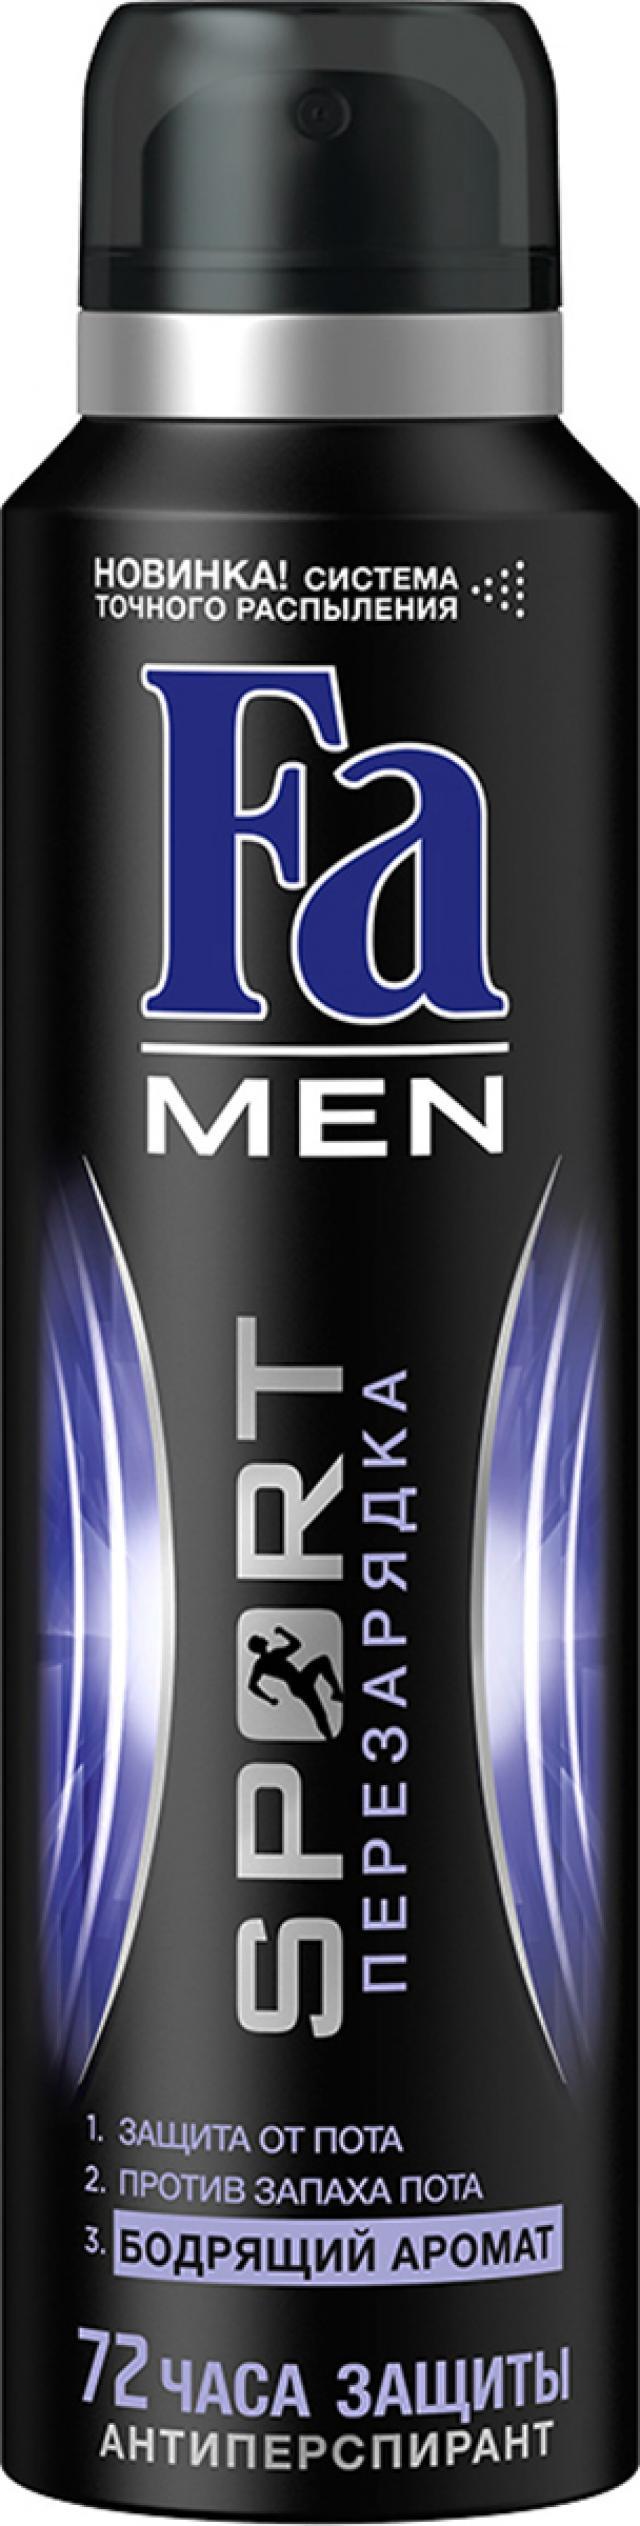 Фа Мен дезодорант-спрей Спорт Перезарядка 150мл купить в Москве по цене от 0 рублей